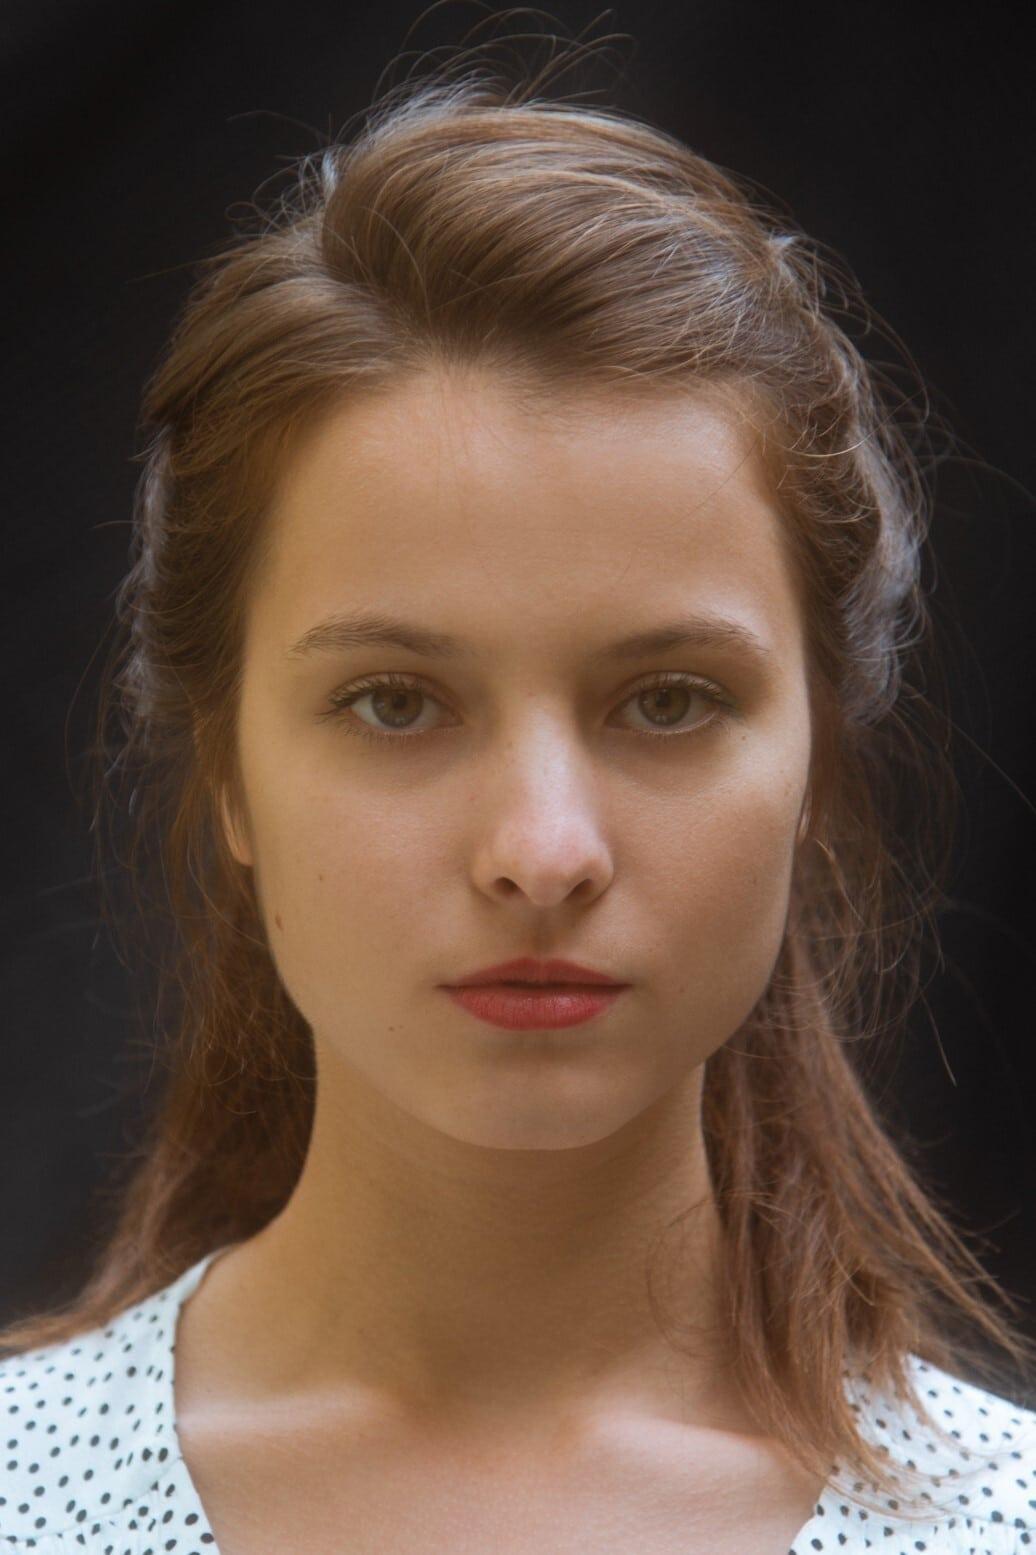 Elina Vildanova